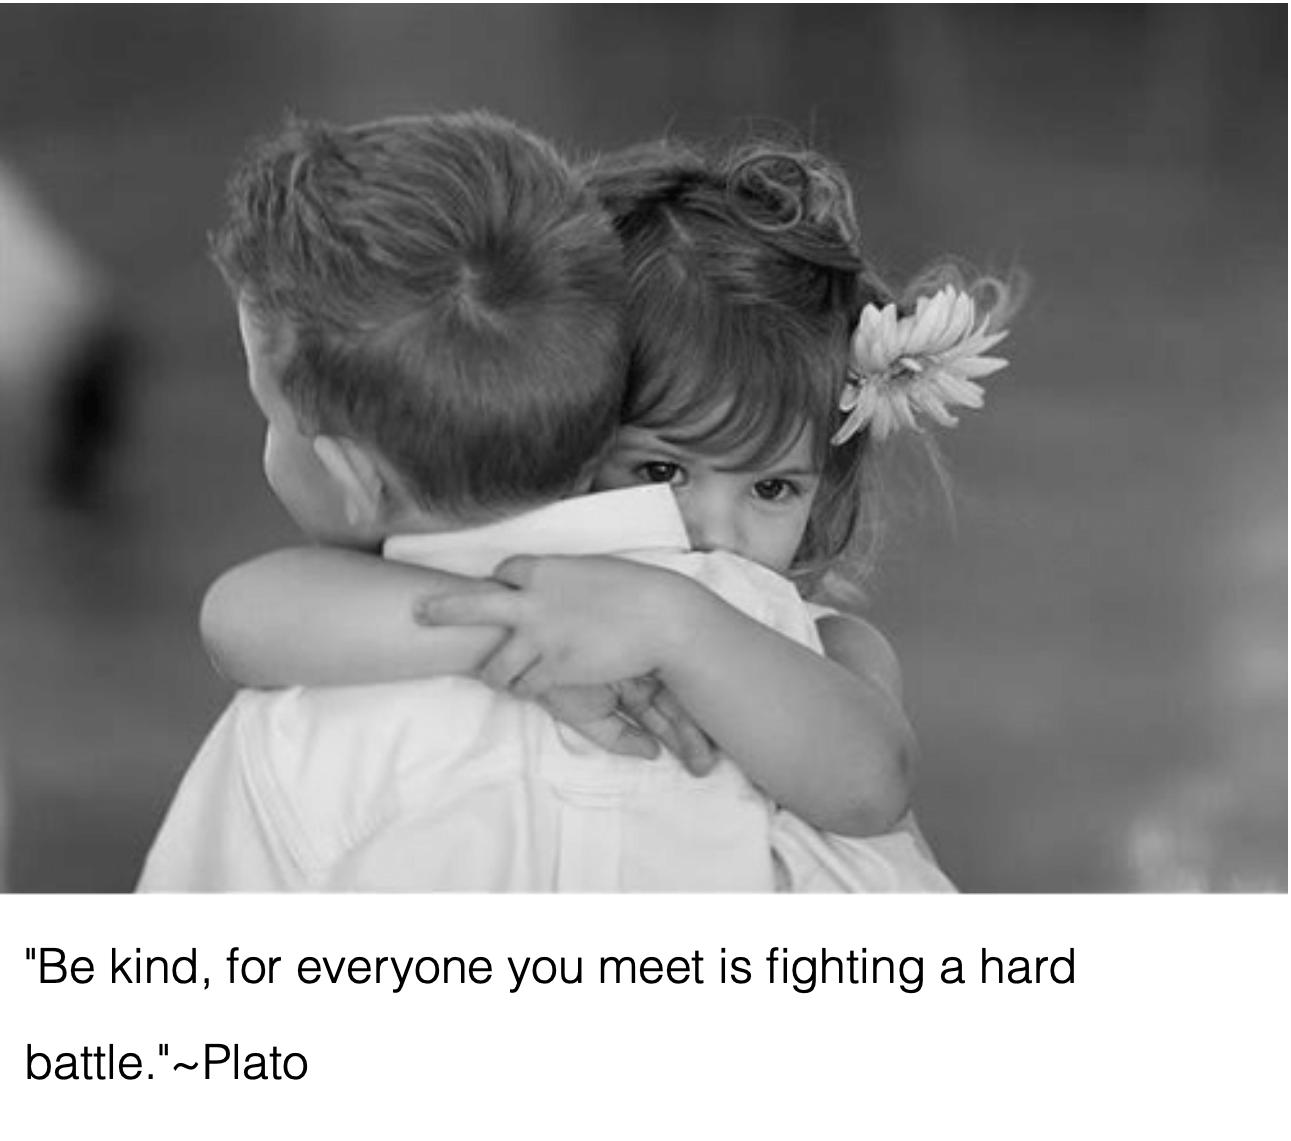 Practice Compassion